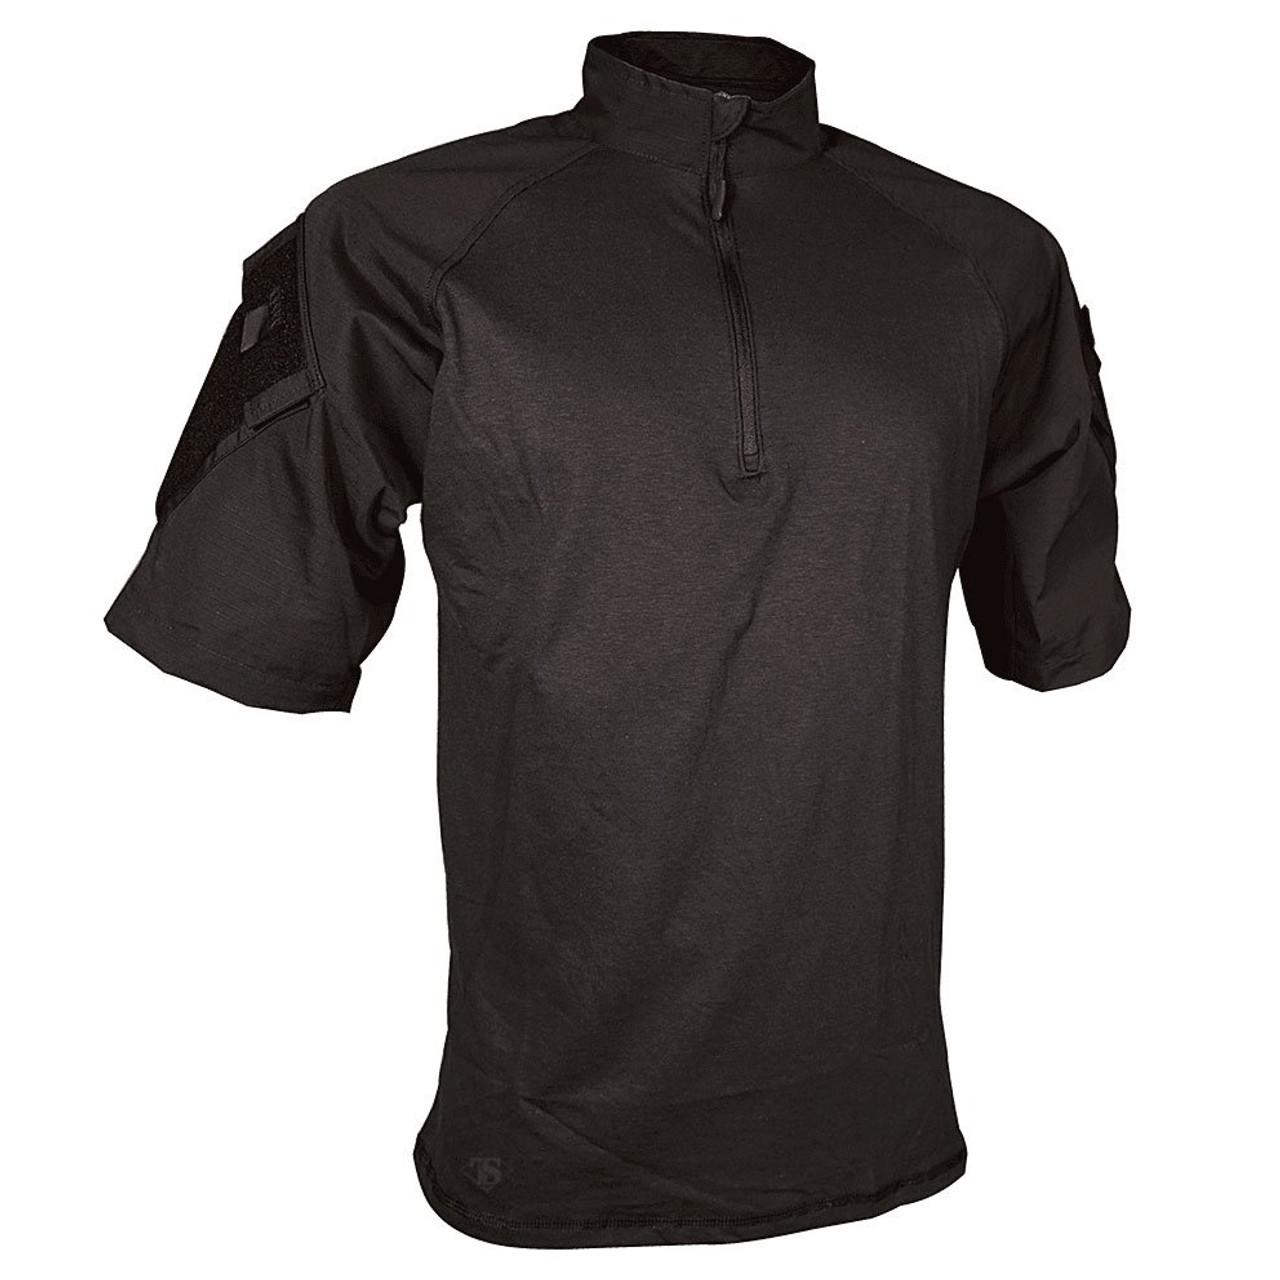 Tru Spec Short Sleeve 1 4 Zip Combat Shirt Combat Shirt Tactical Shirt Ray Allen Manufacturing